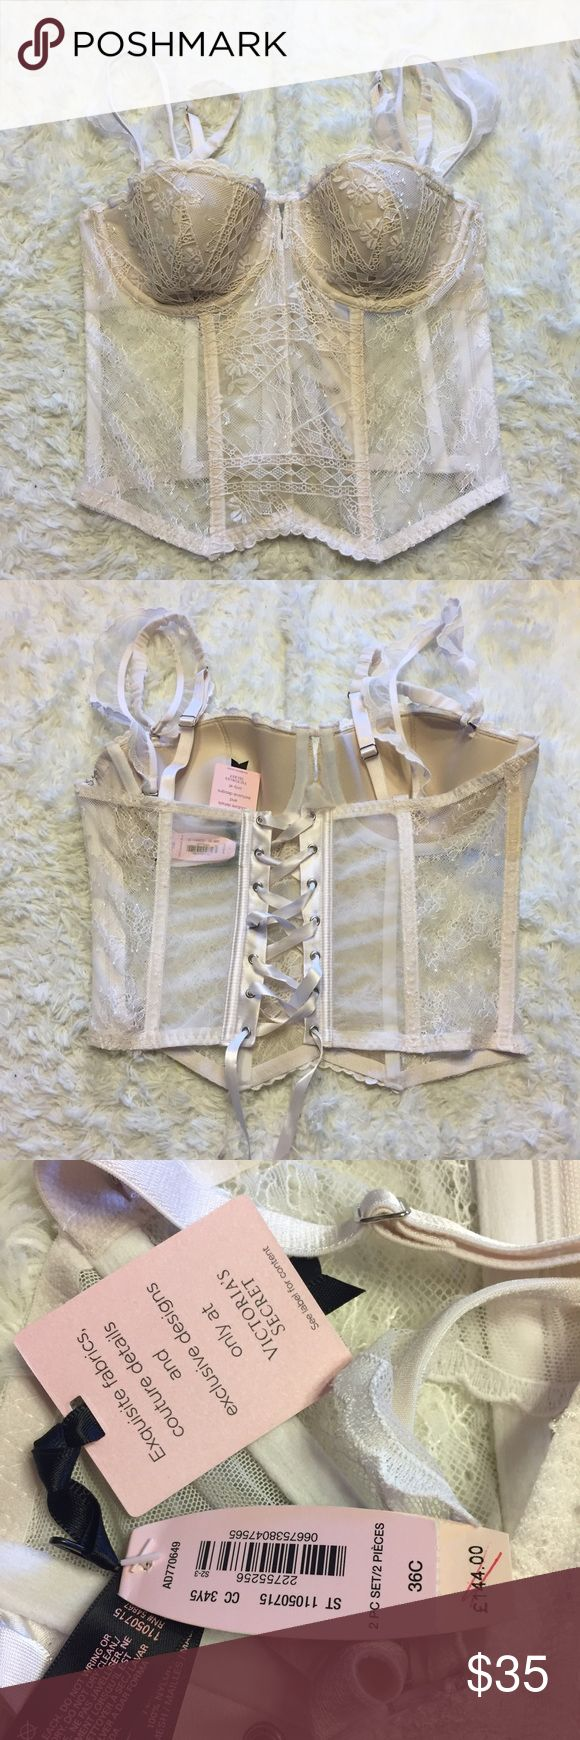 VS Designer Collection Coconut Bra 36C Padded, not a push up Victoria's Secret Intimates & Sleepwear Bras